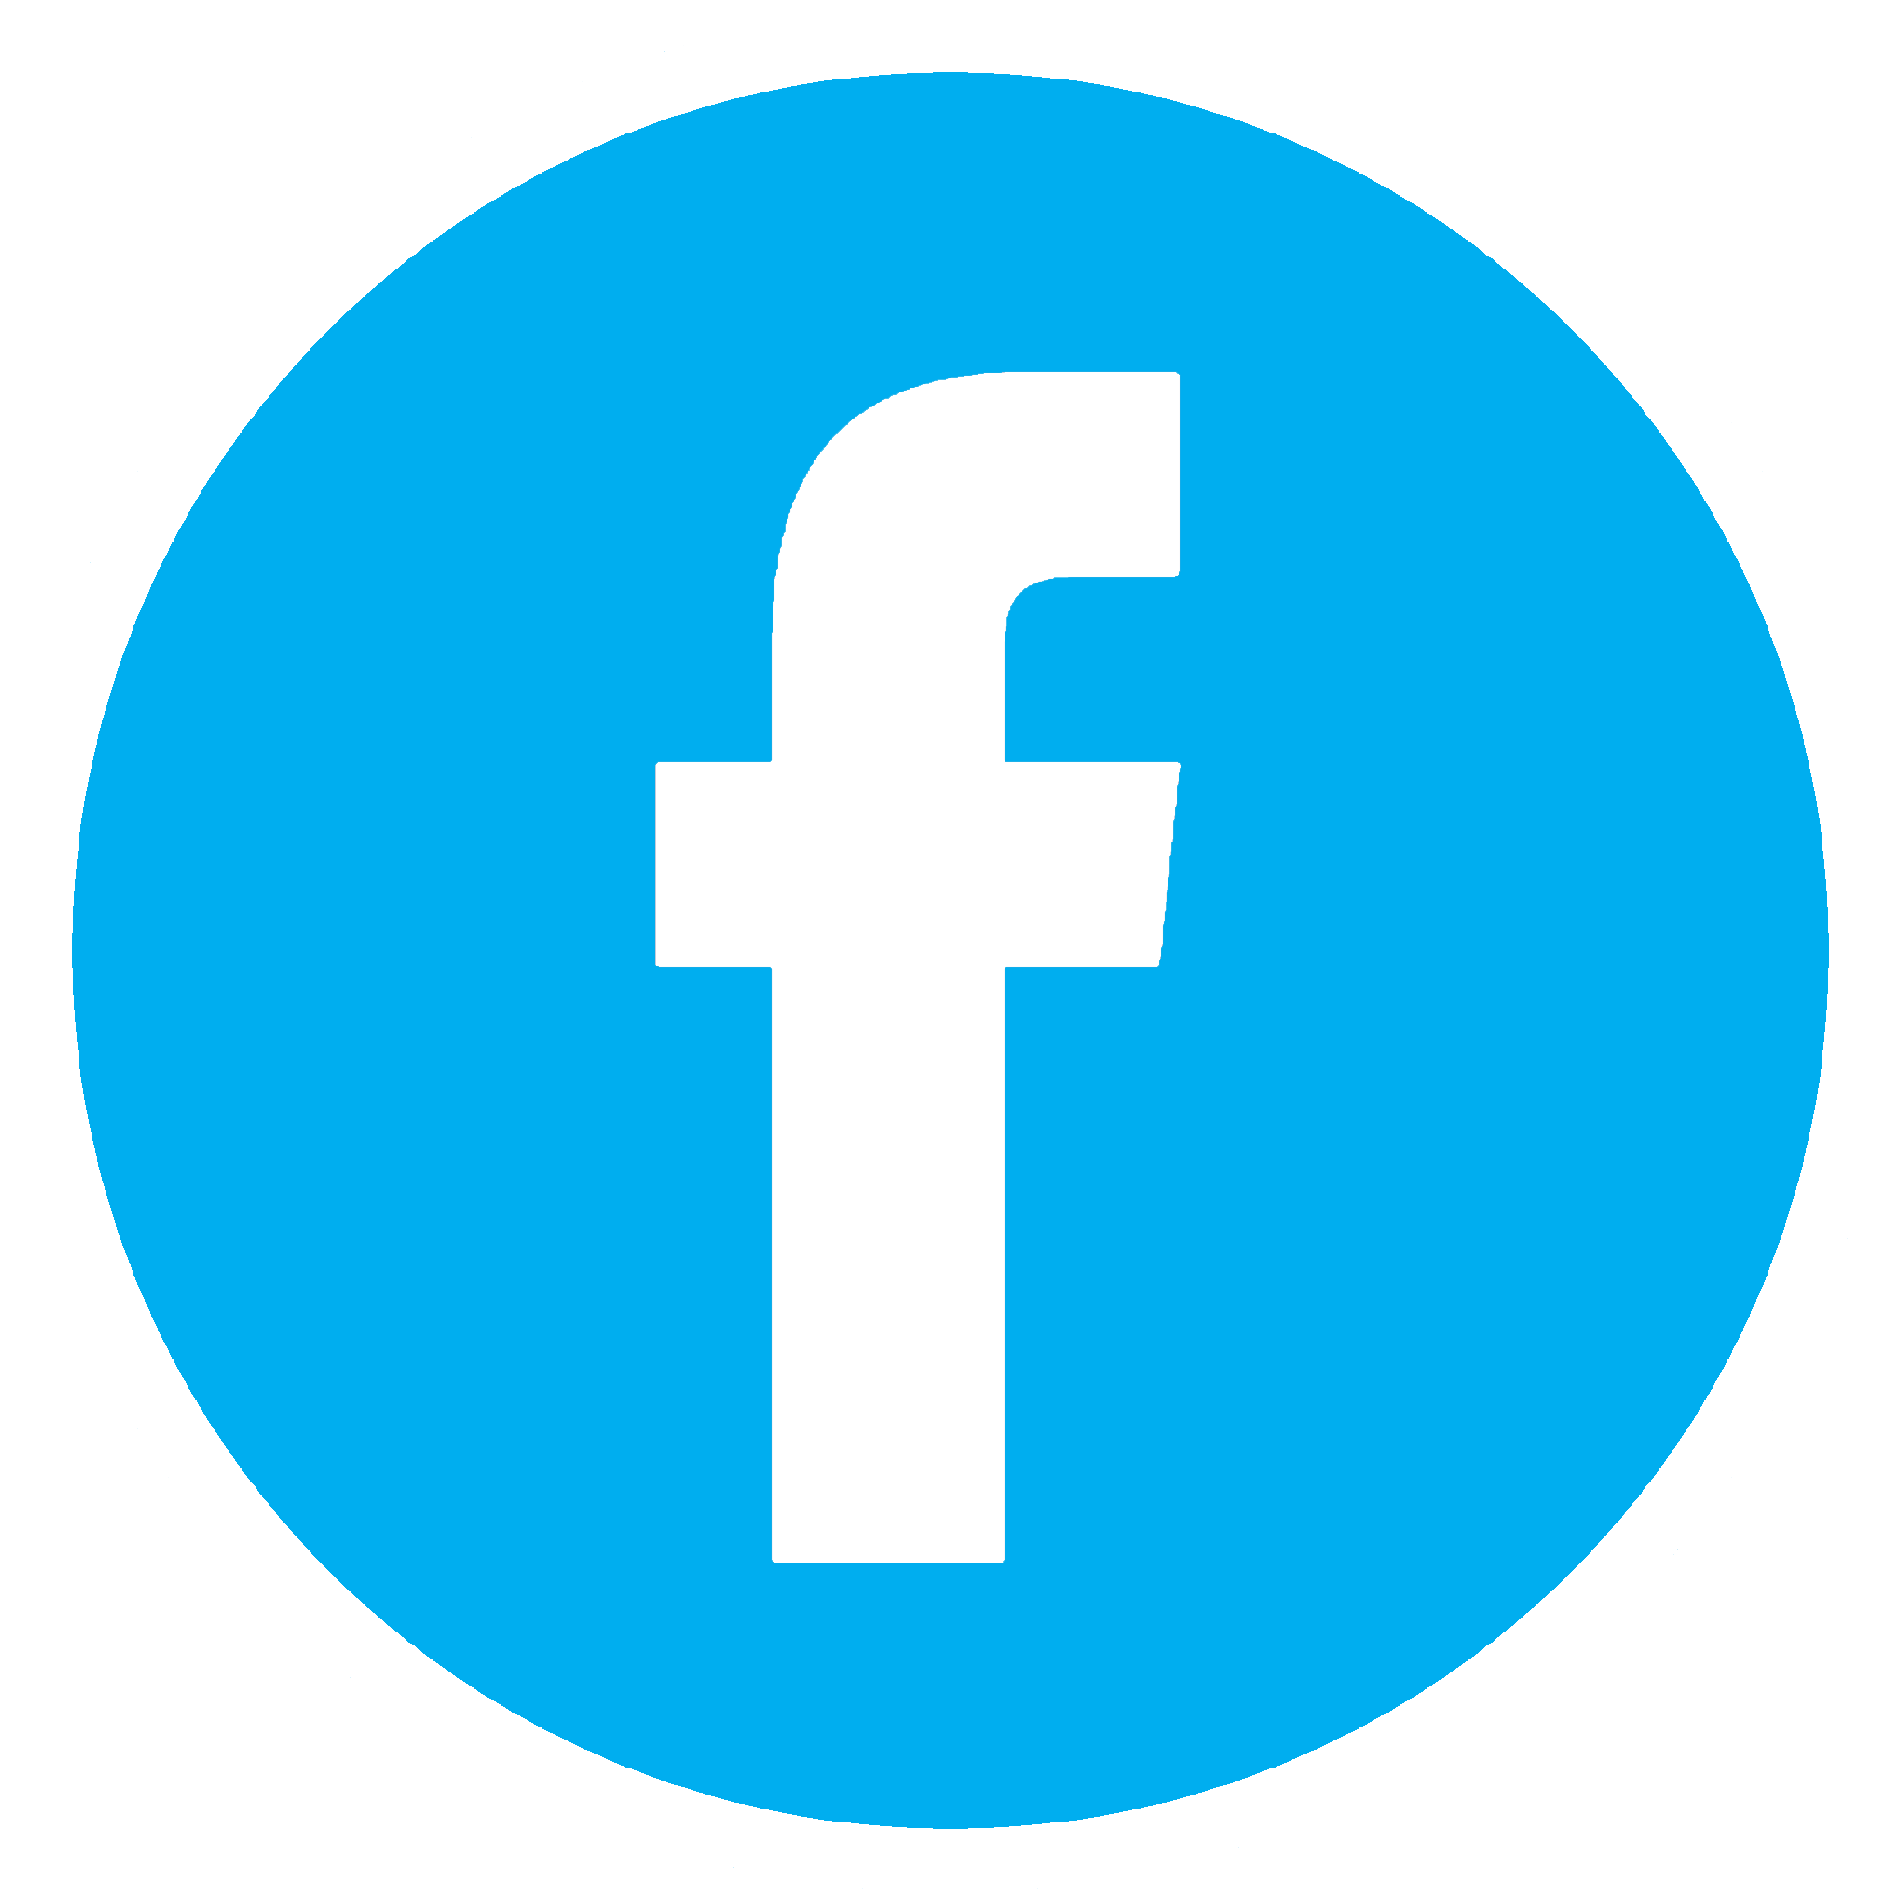 facebook-transparent-clipart-9.png